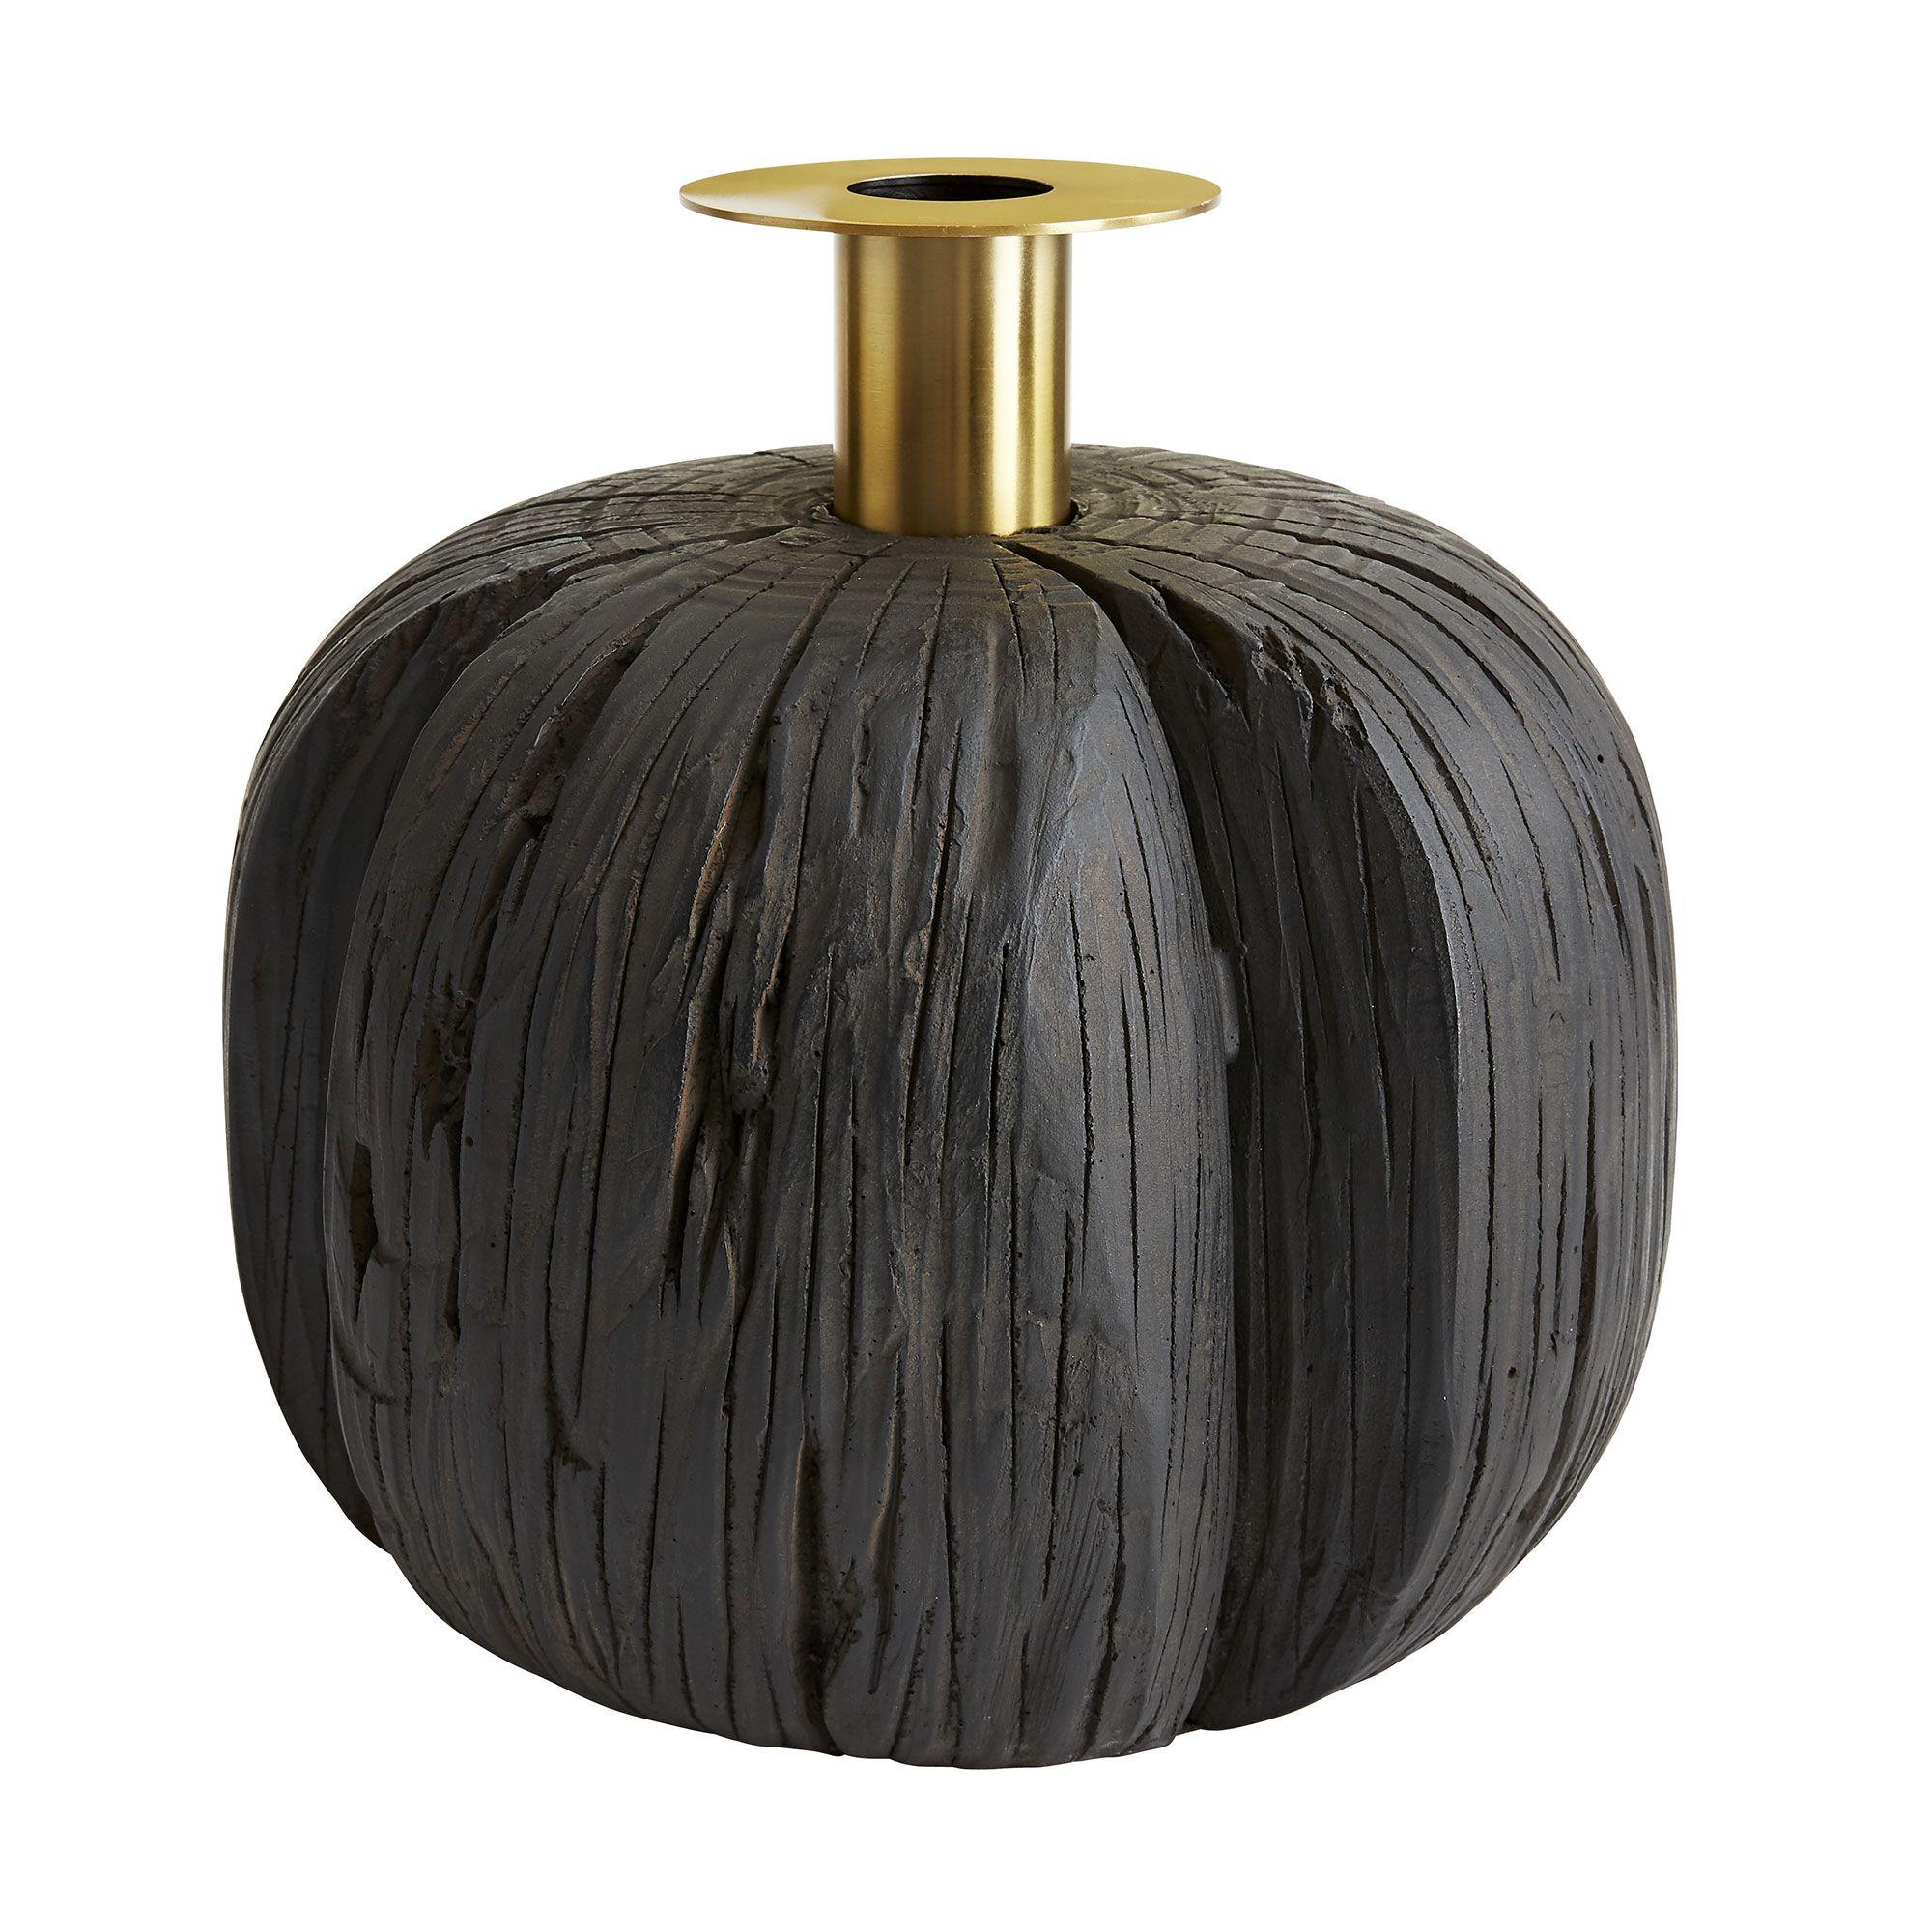 Harwill Vase